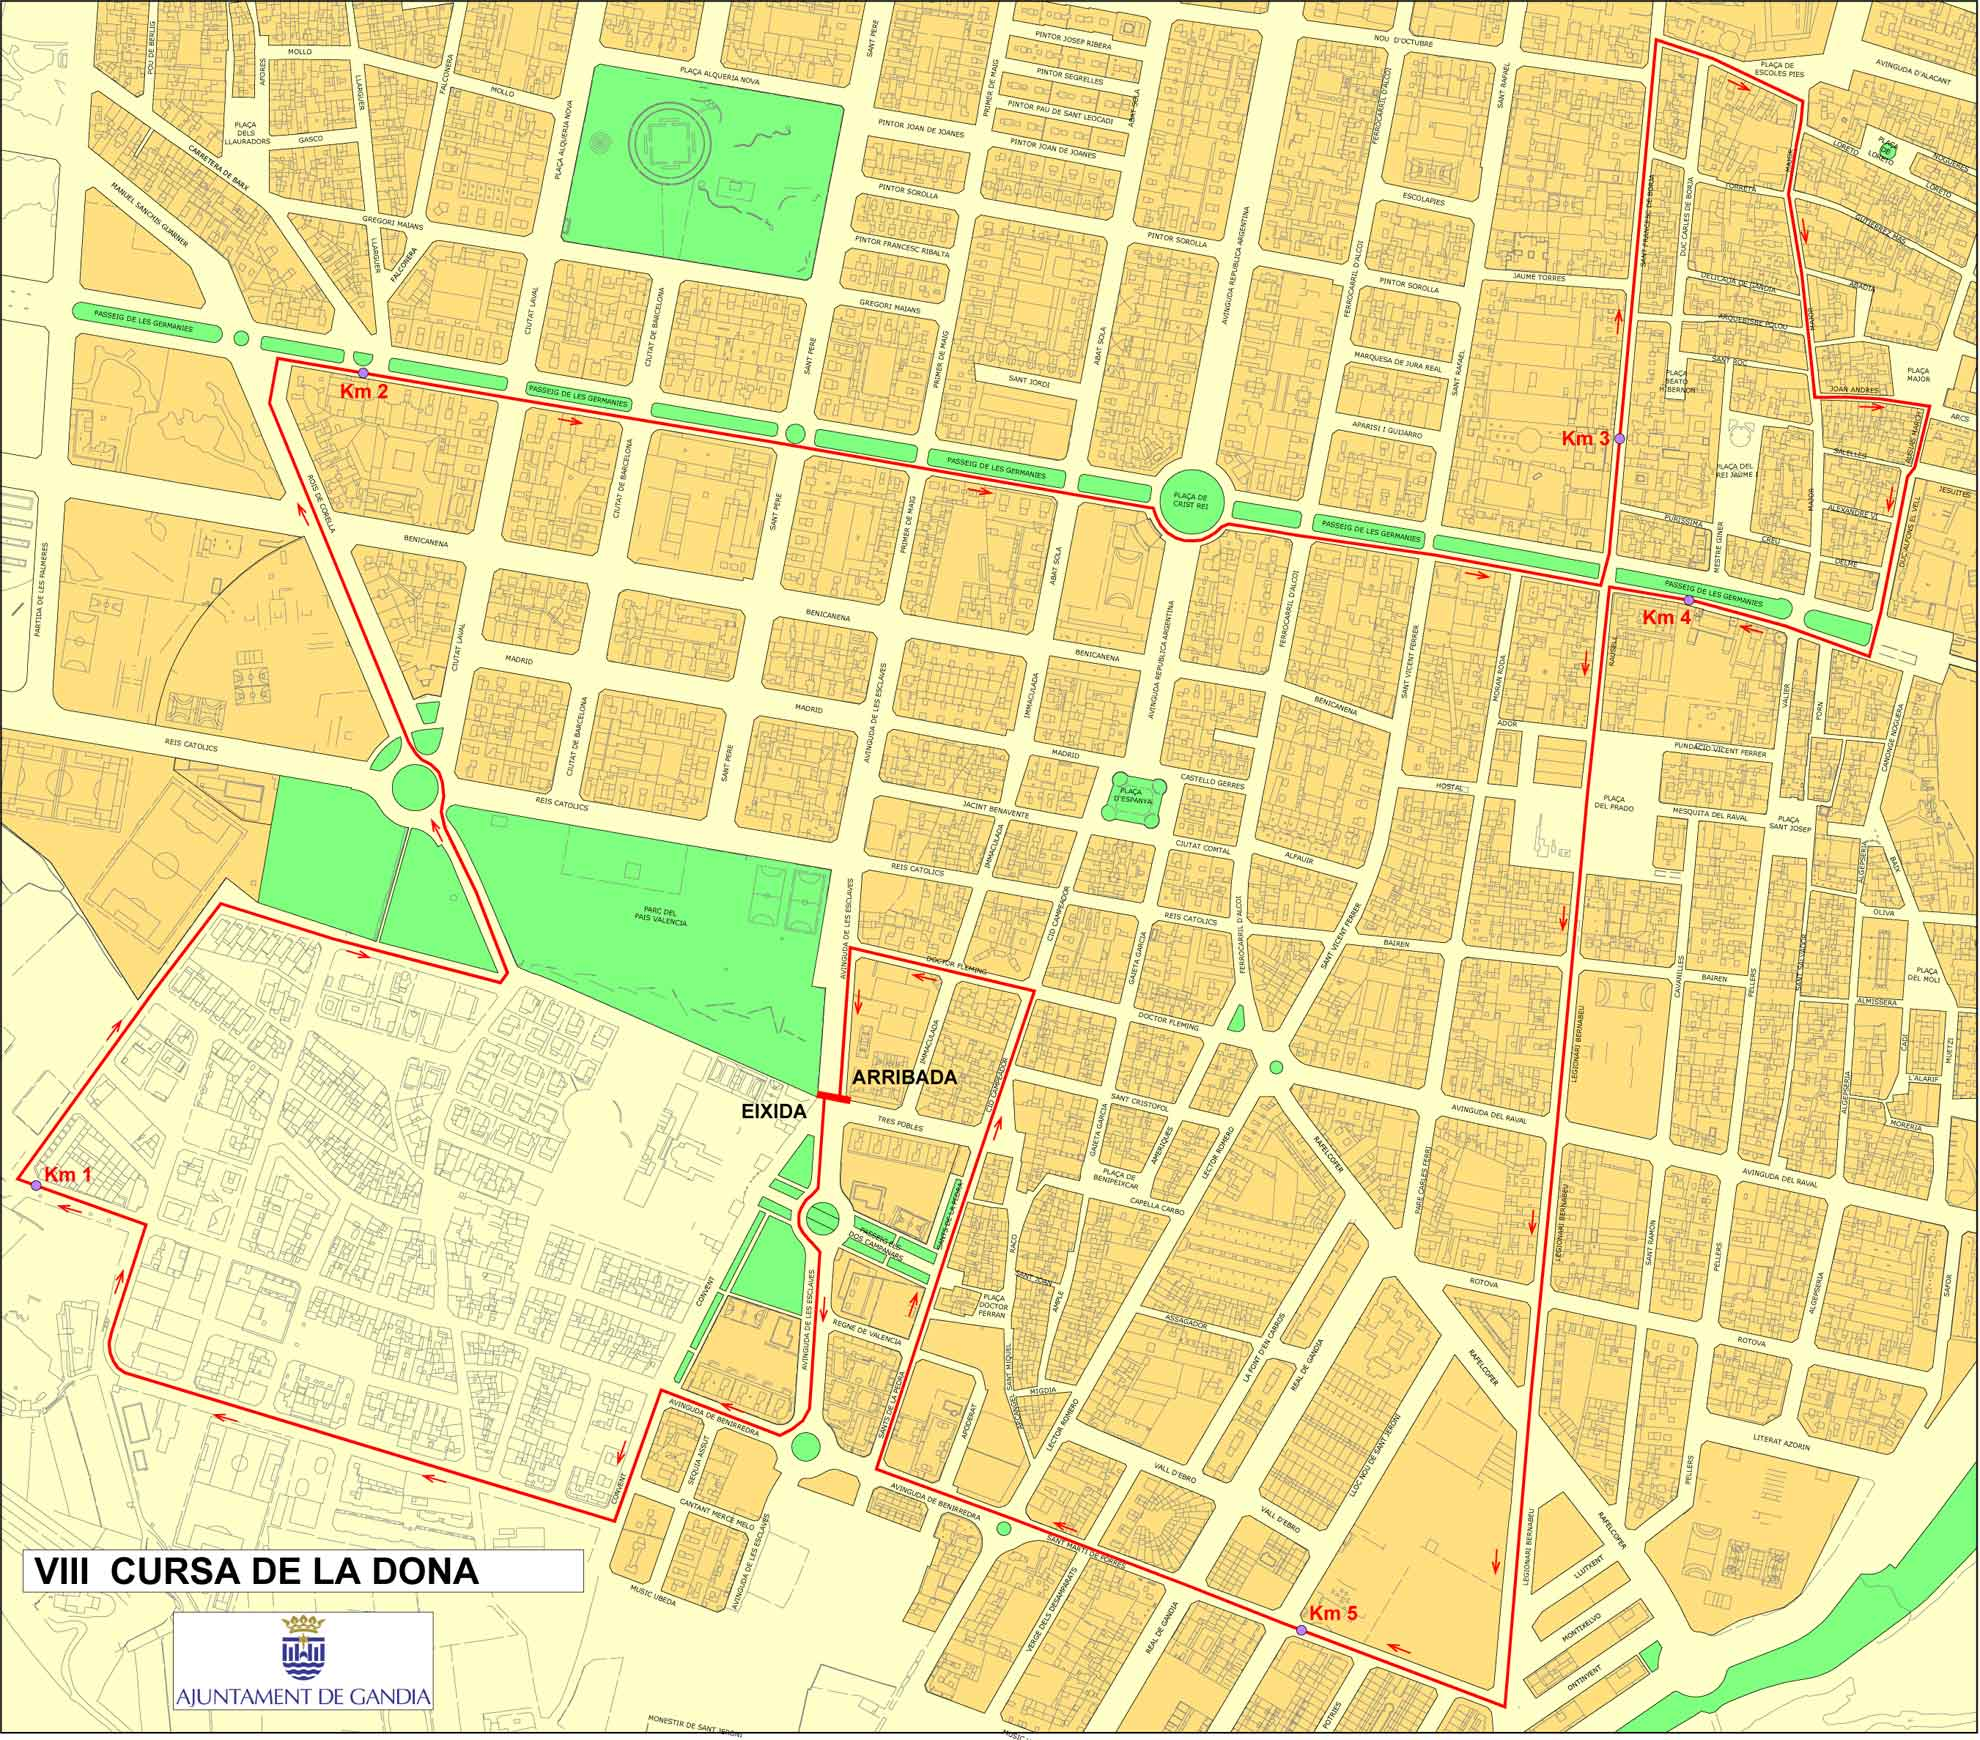 Mapa del recorrido de la Cursa de la Dona Gandia